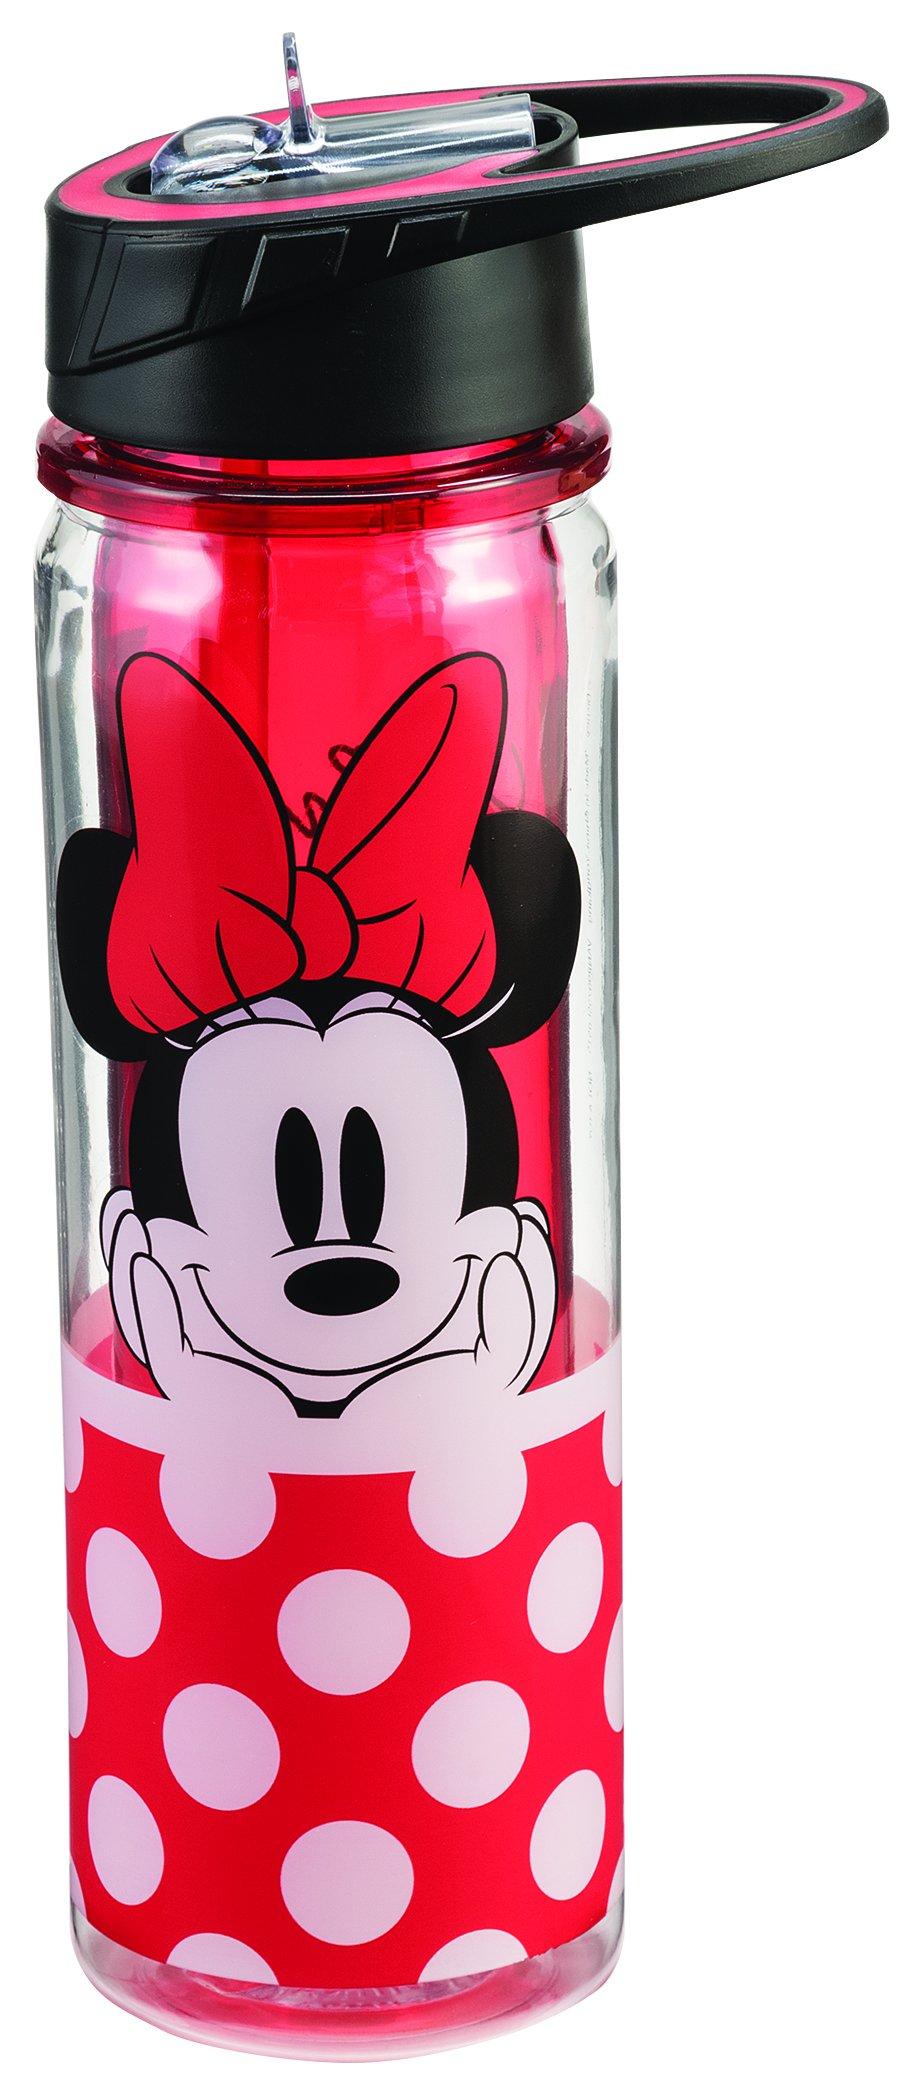 Disney Minnie Mouse 18 Oz. Tritan Water Bottle 89075